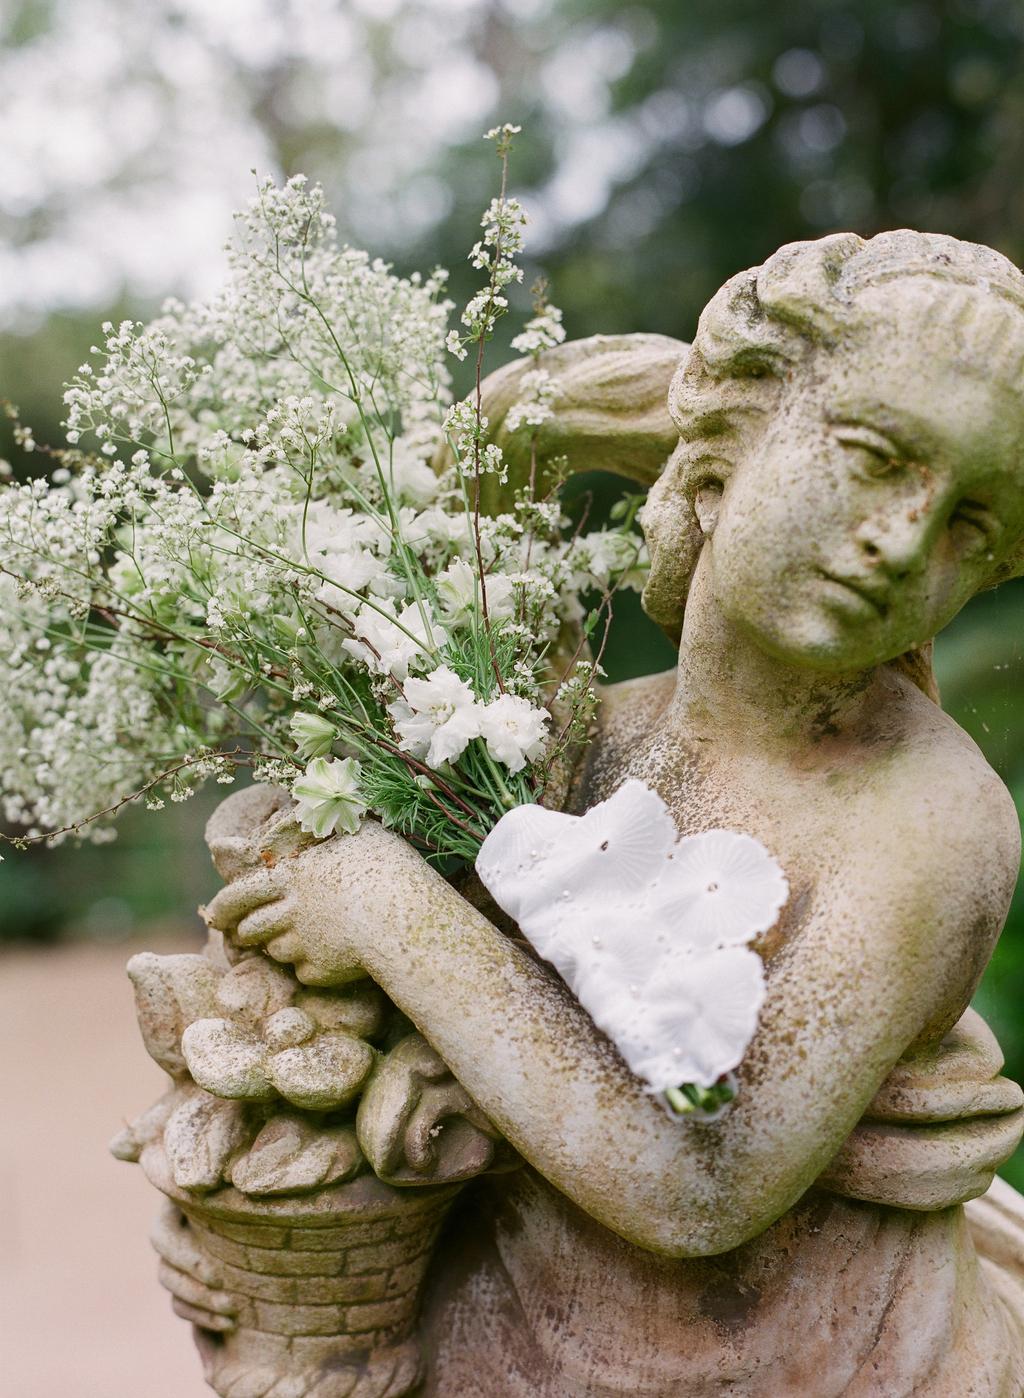 Styled-wedding-santa-barbara-chic-beaux-arts-photographie-italian-bohemian-wedding-venue-garden-flowers-white-bouquet-024.full